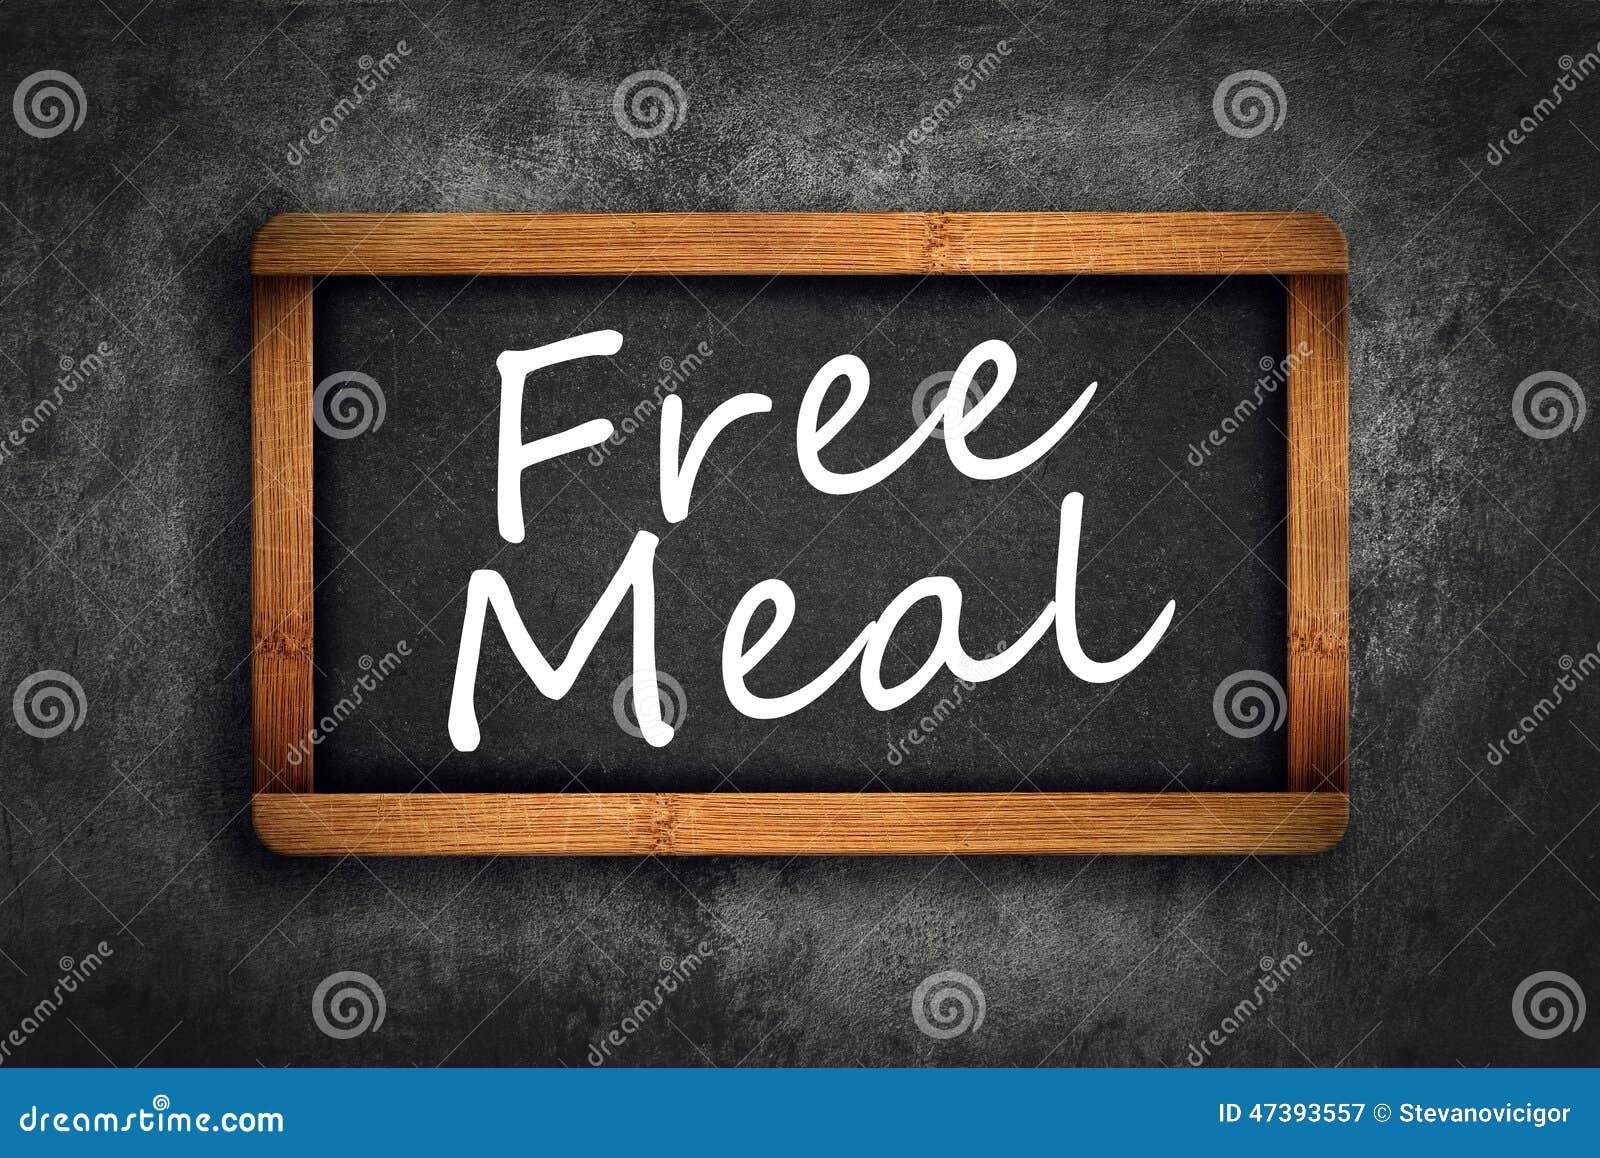 Free Meal Title On Restaurant Slate Chalkboard Stock Photo